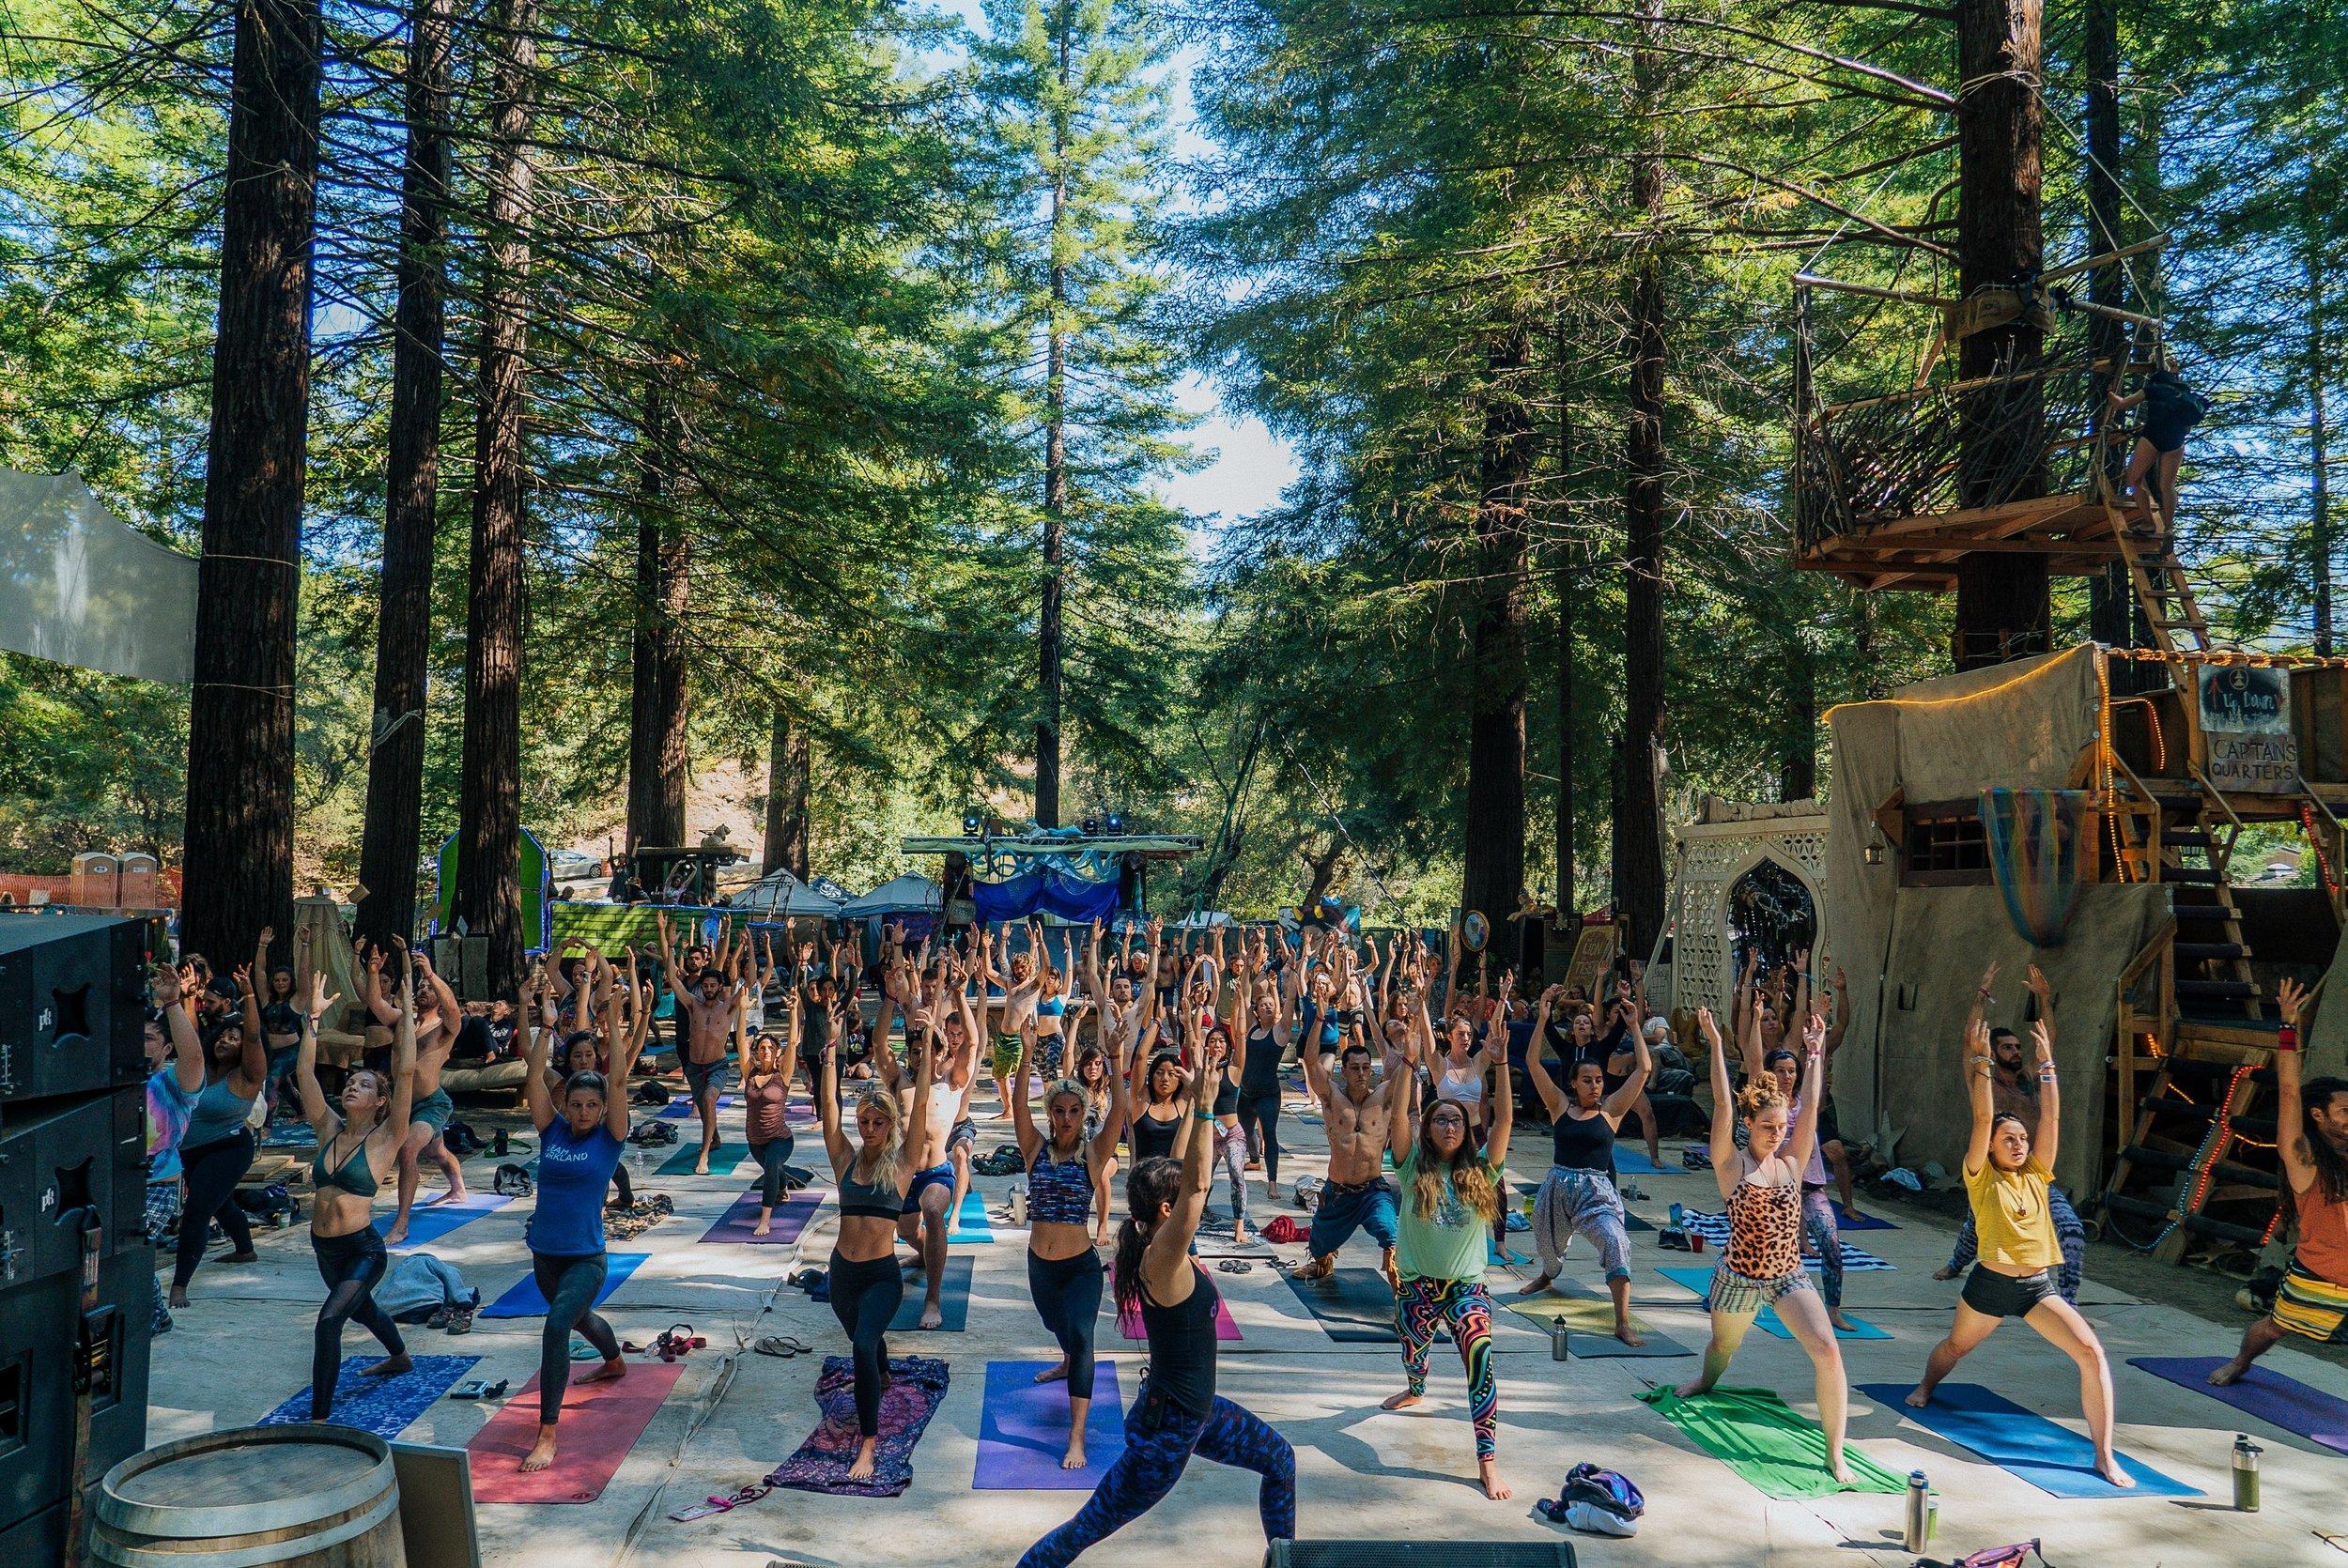 #yogawithgina - @djginaturner